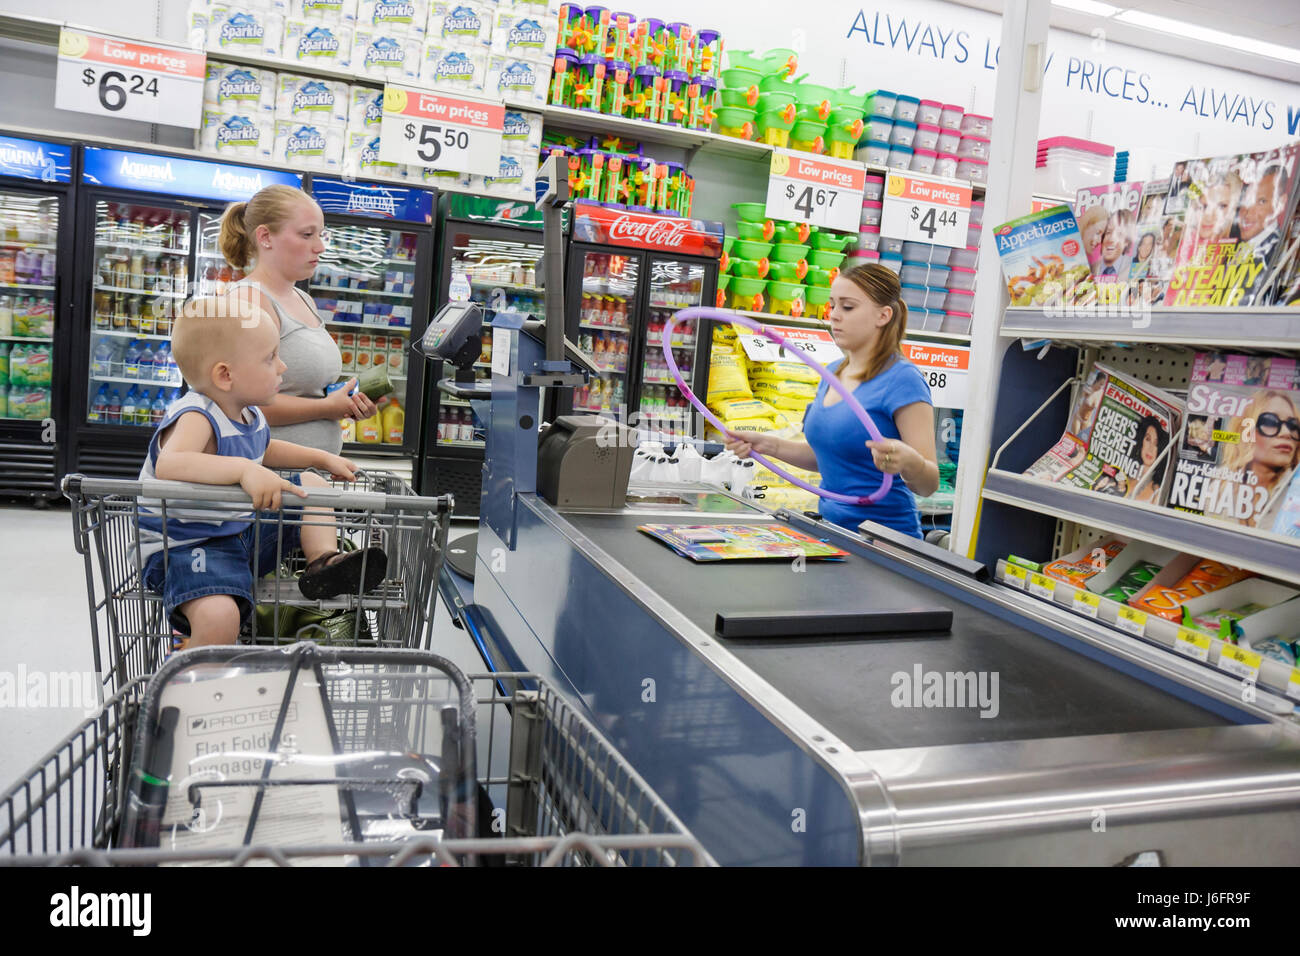 Wisconsin Kenosha Walmart Wal-Mart discount superstore retailer woman boy toddler girl cashier teen job shopping - Stock Image